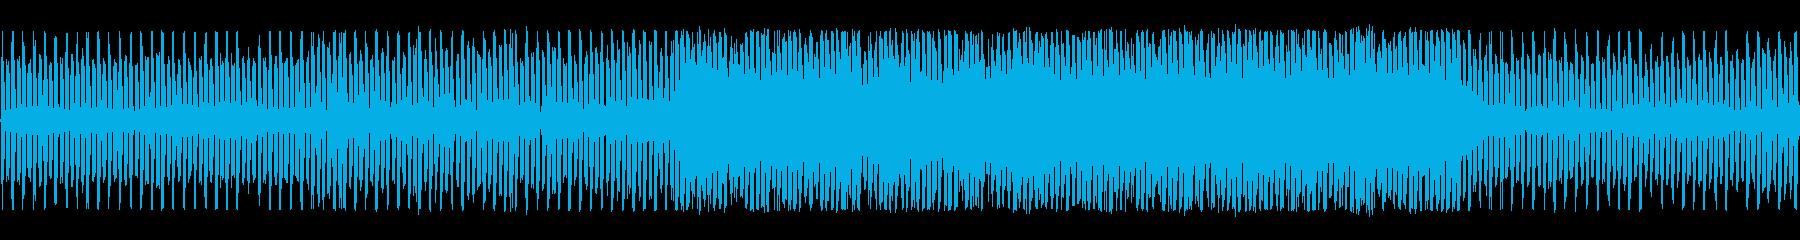 8-Bit_Action Aggressive10の再生済みの波形